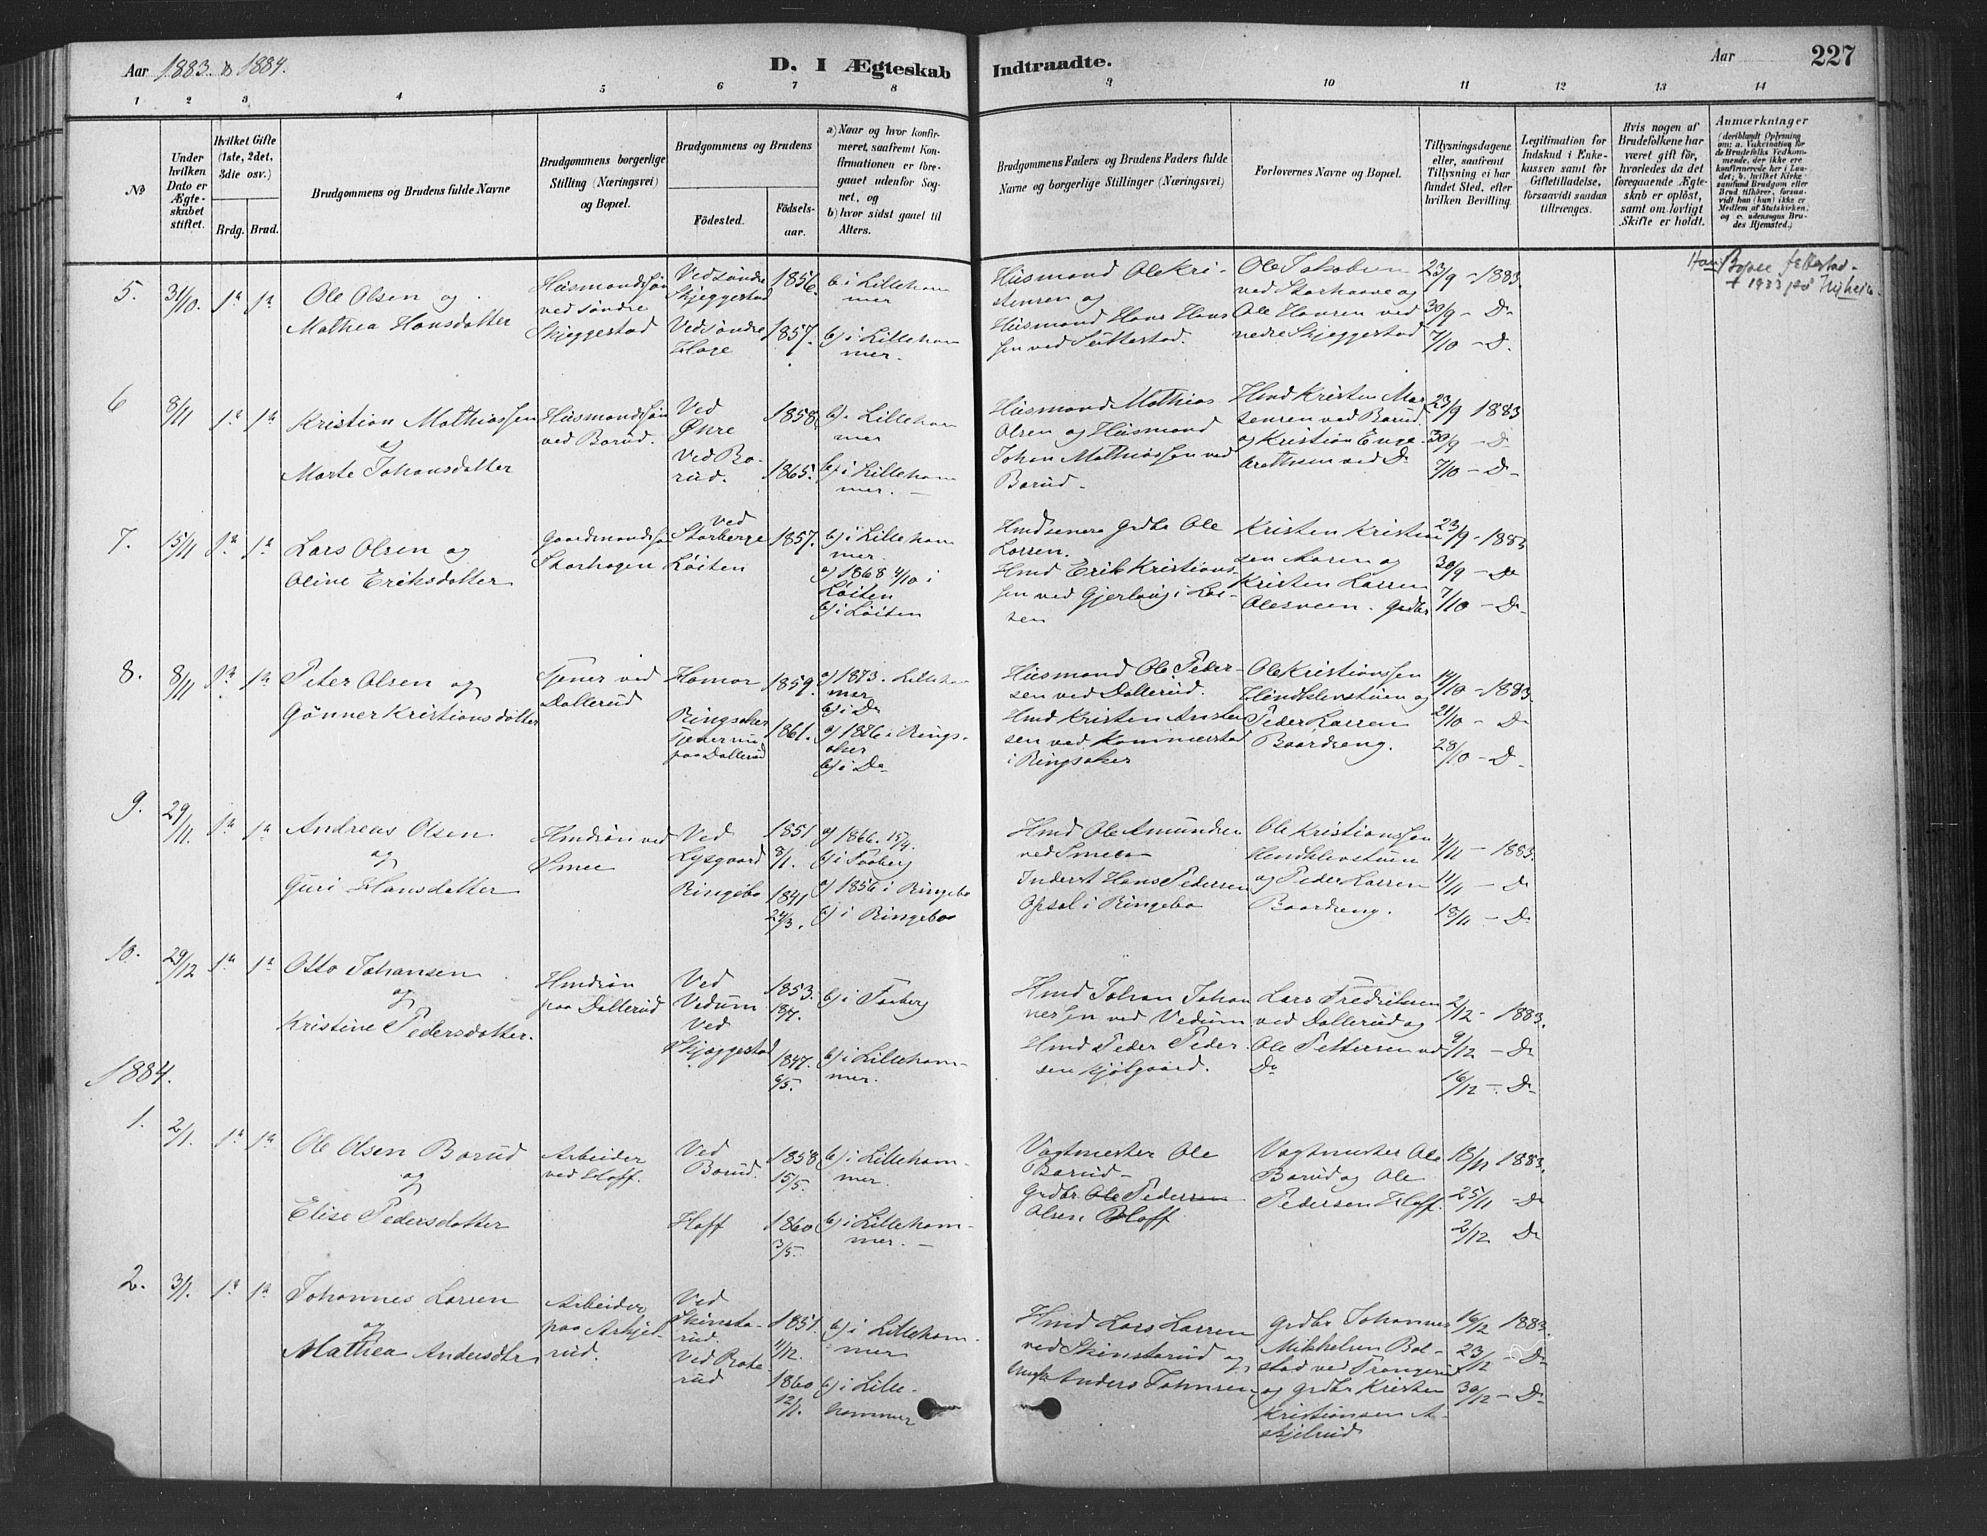 SAH, Fåberg prestekontor, Ministerialbok nr. 9, 1879-1898, s. 227